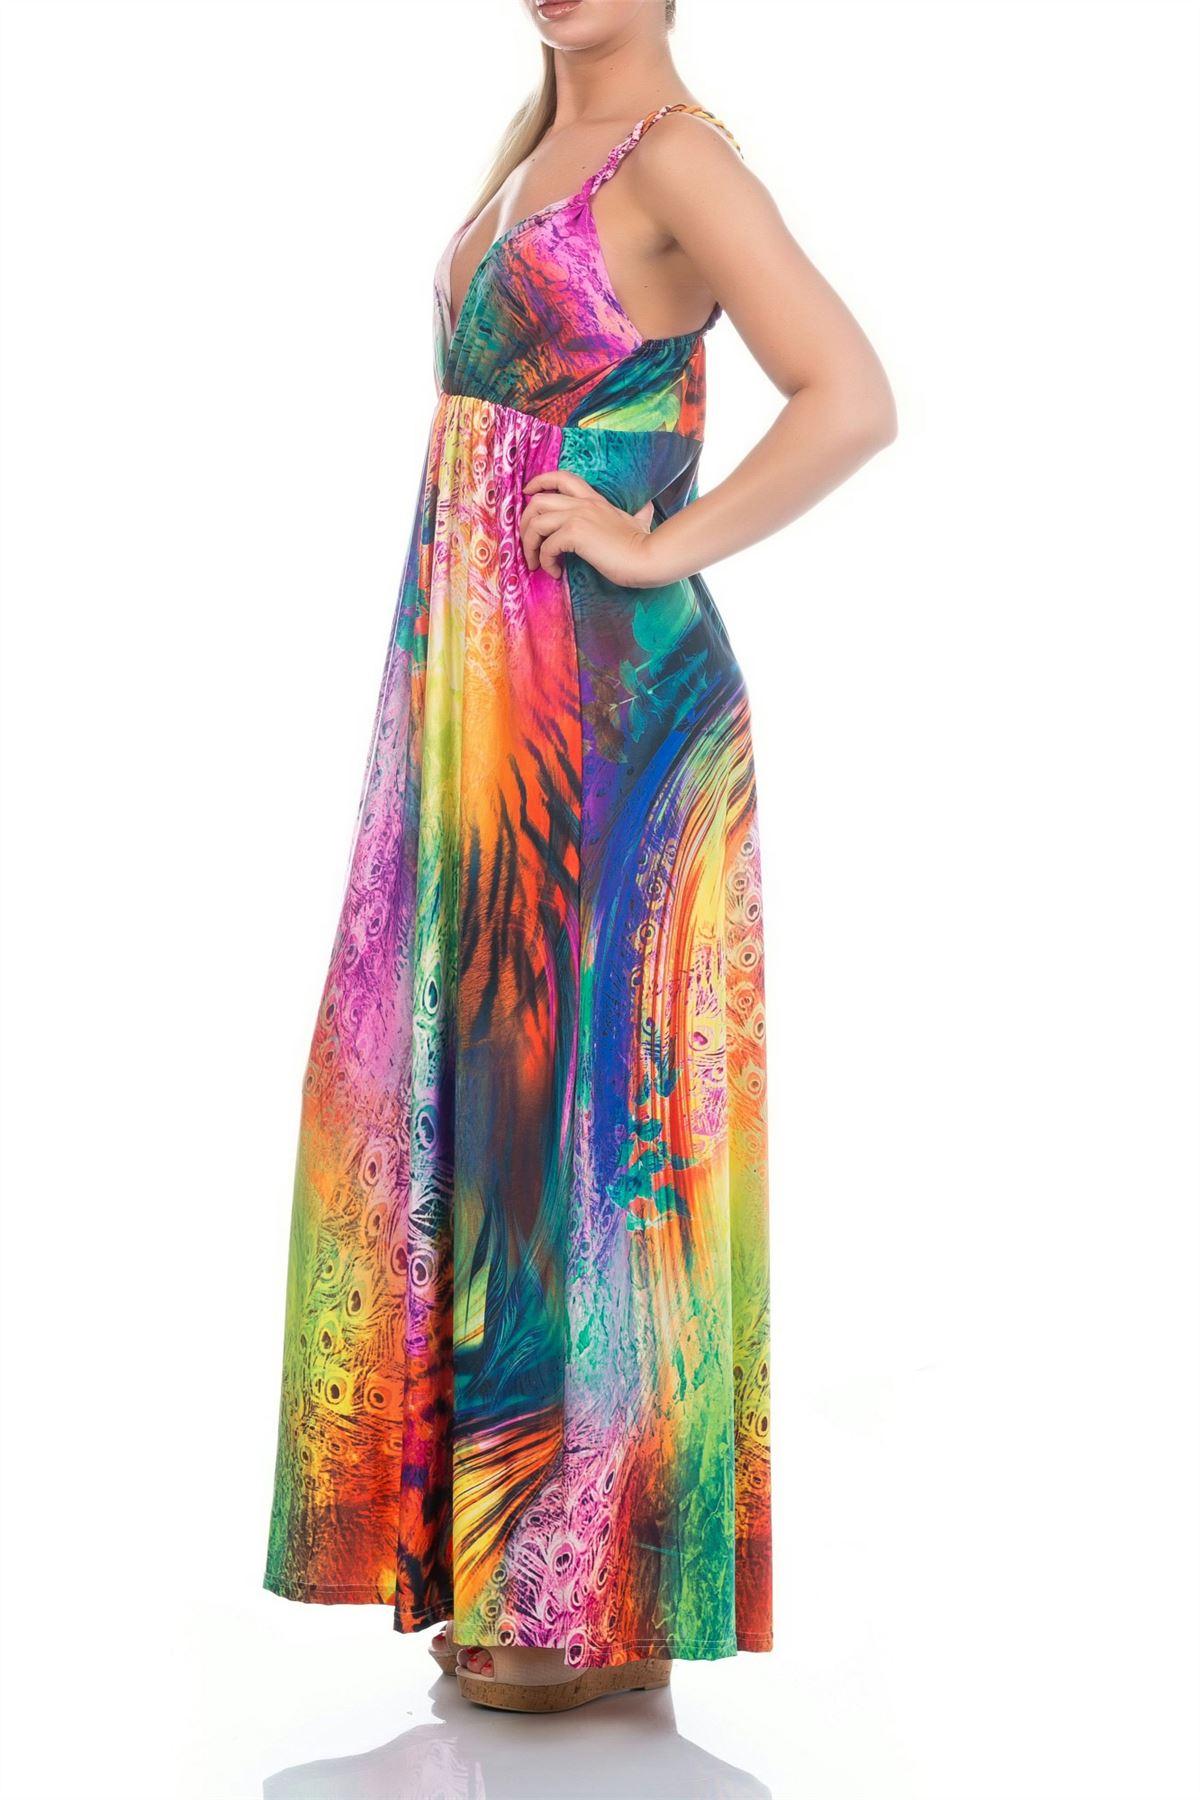 HD wallpapers ladies plus size maxi dresses